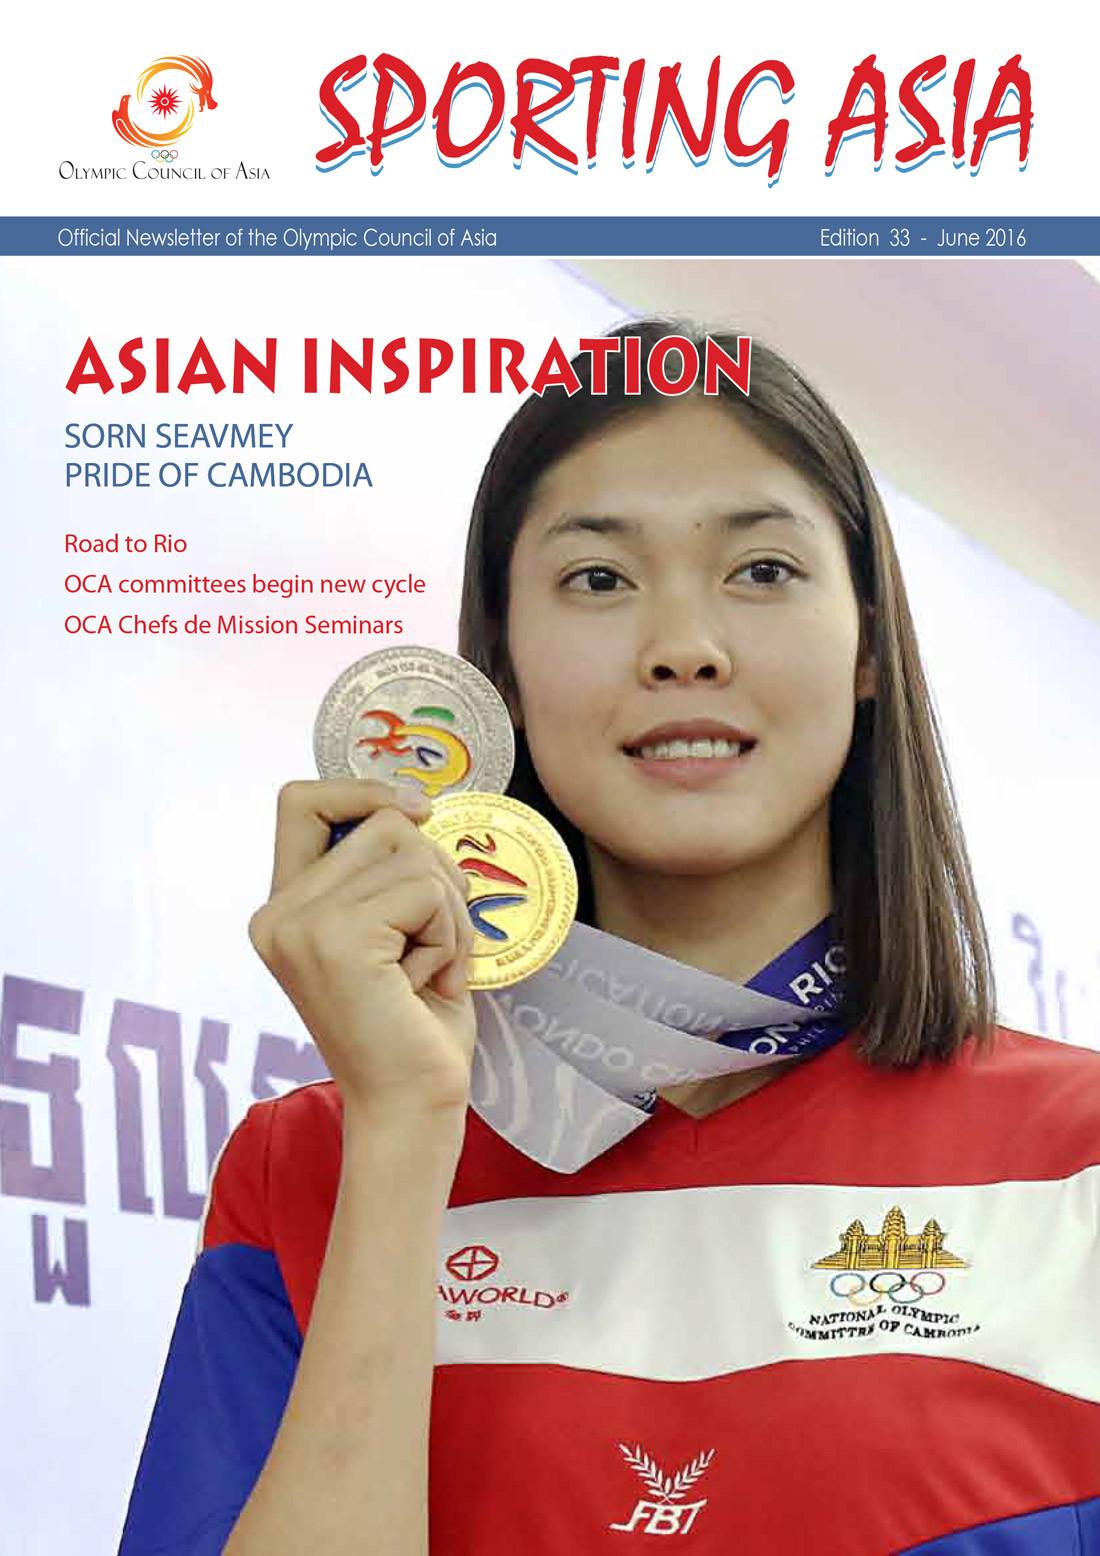 Sporting Asia - Edition 33 - JUN 2016